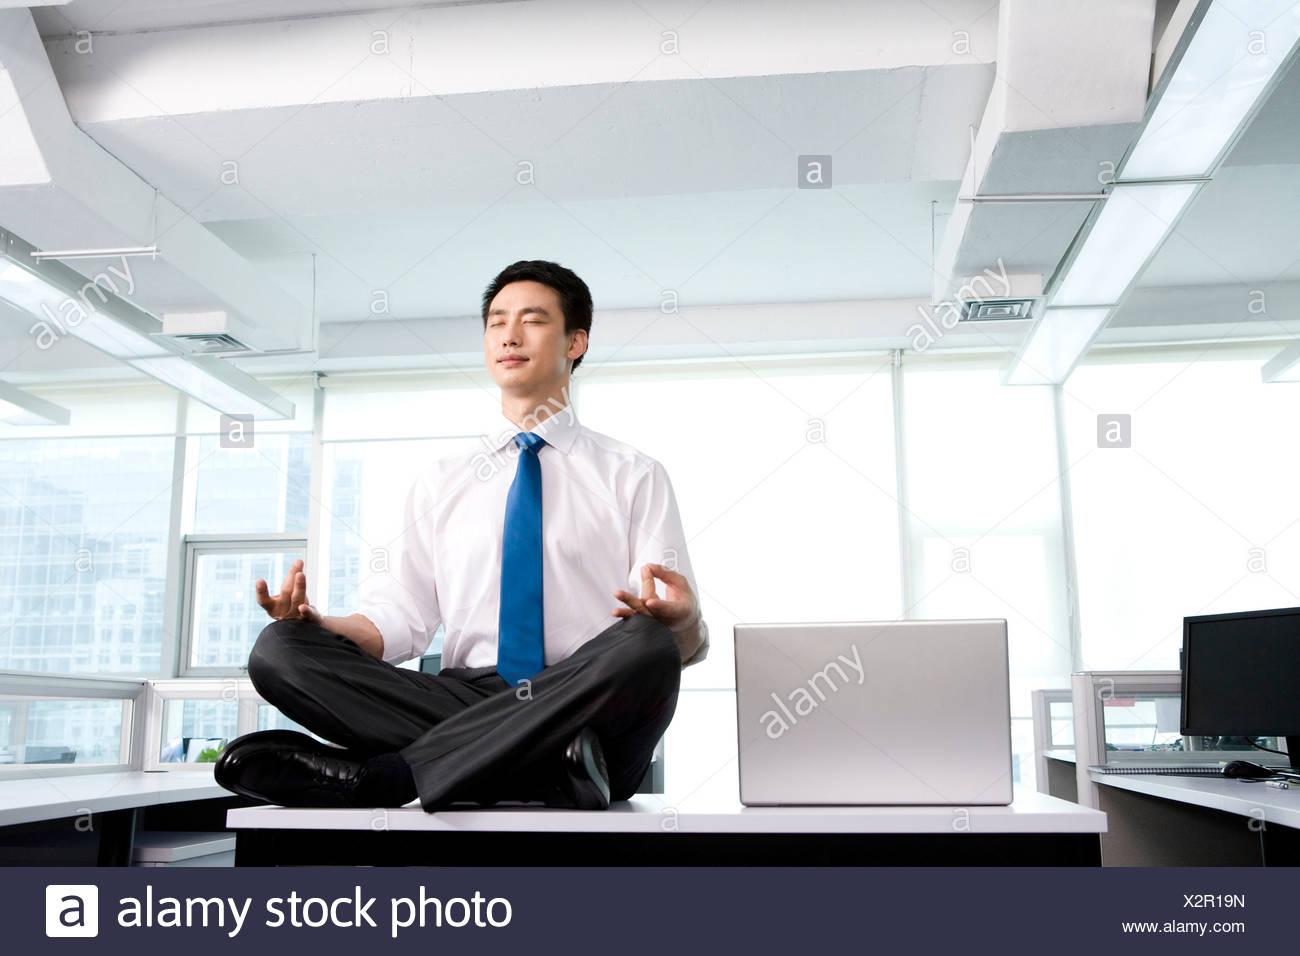 meditation businessman office. Meditation In The Office - Stock Image Businessman